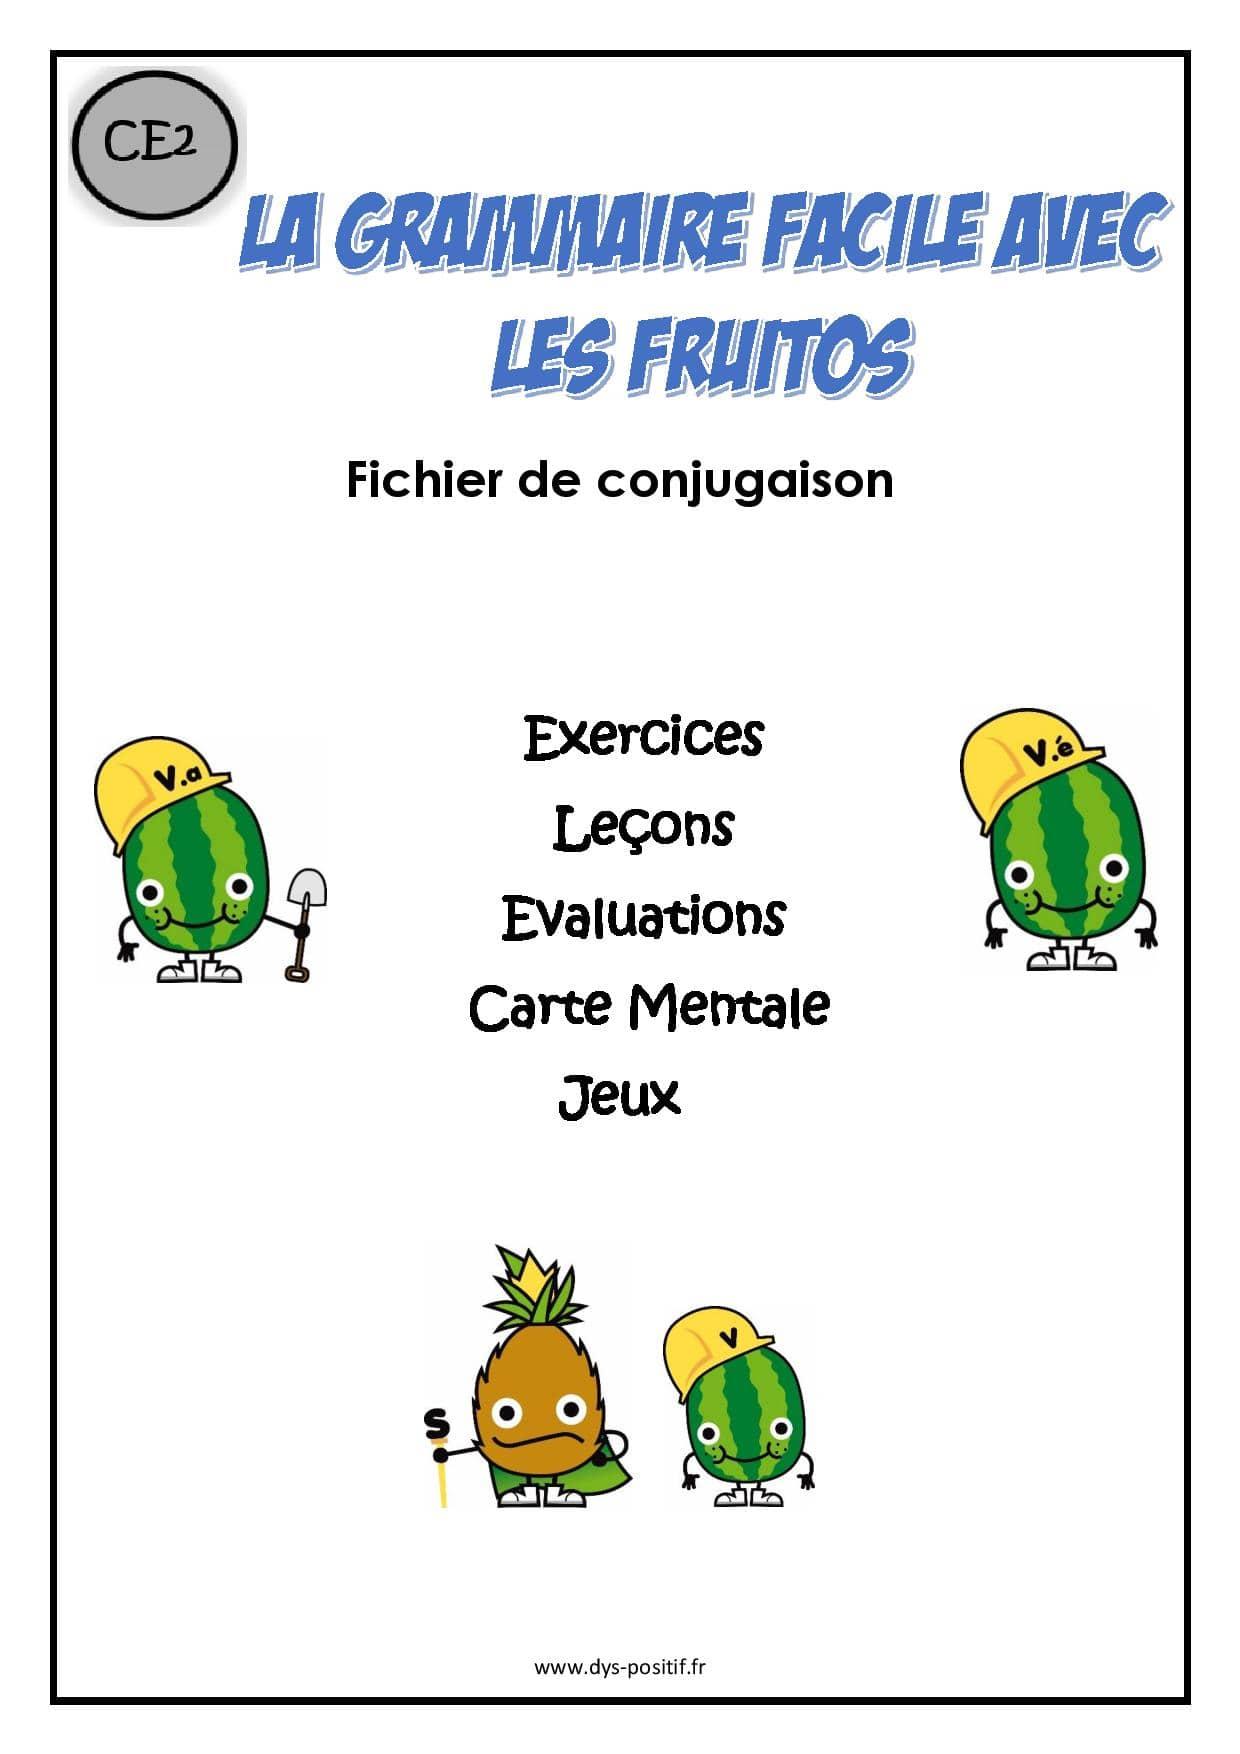 Conjugaison CE2 - Méthode Fruitos